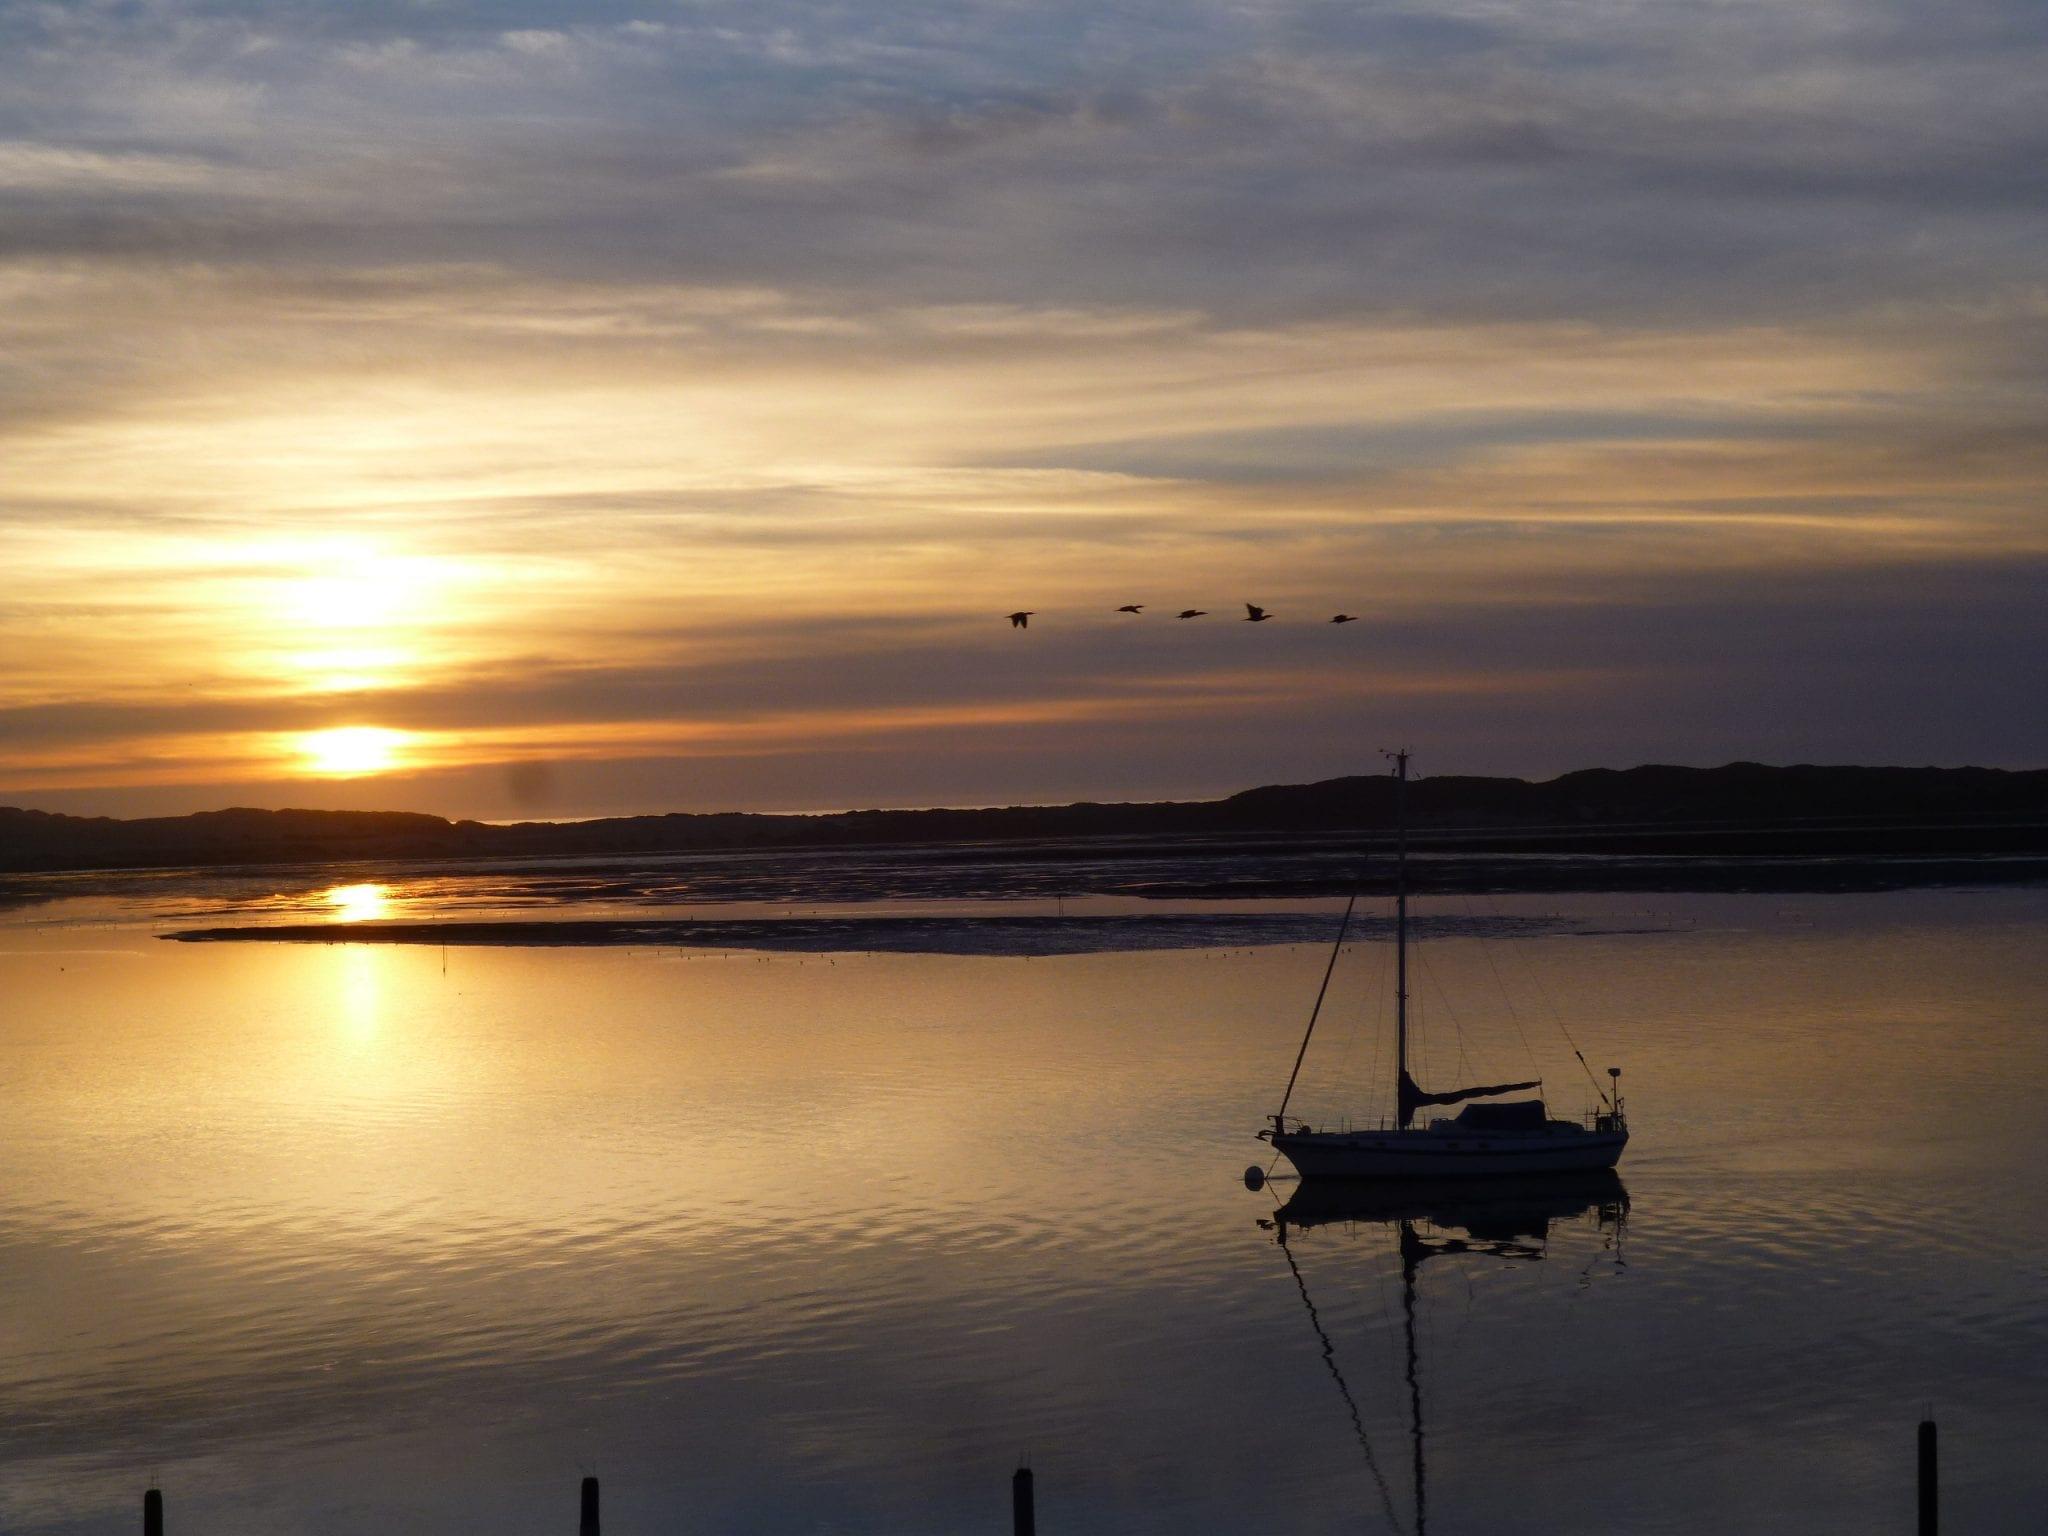 Best Sunset with birds